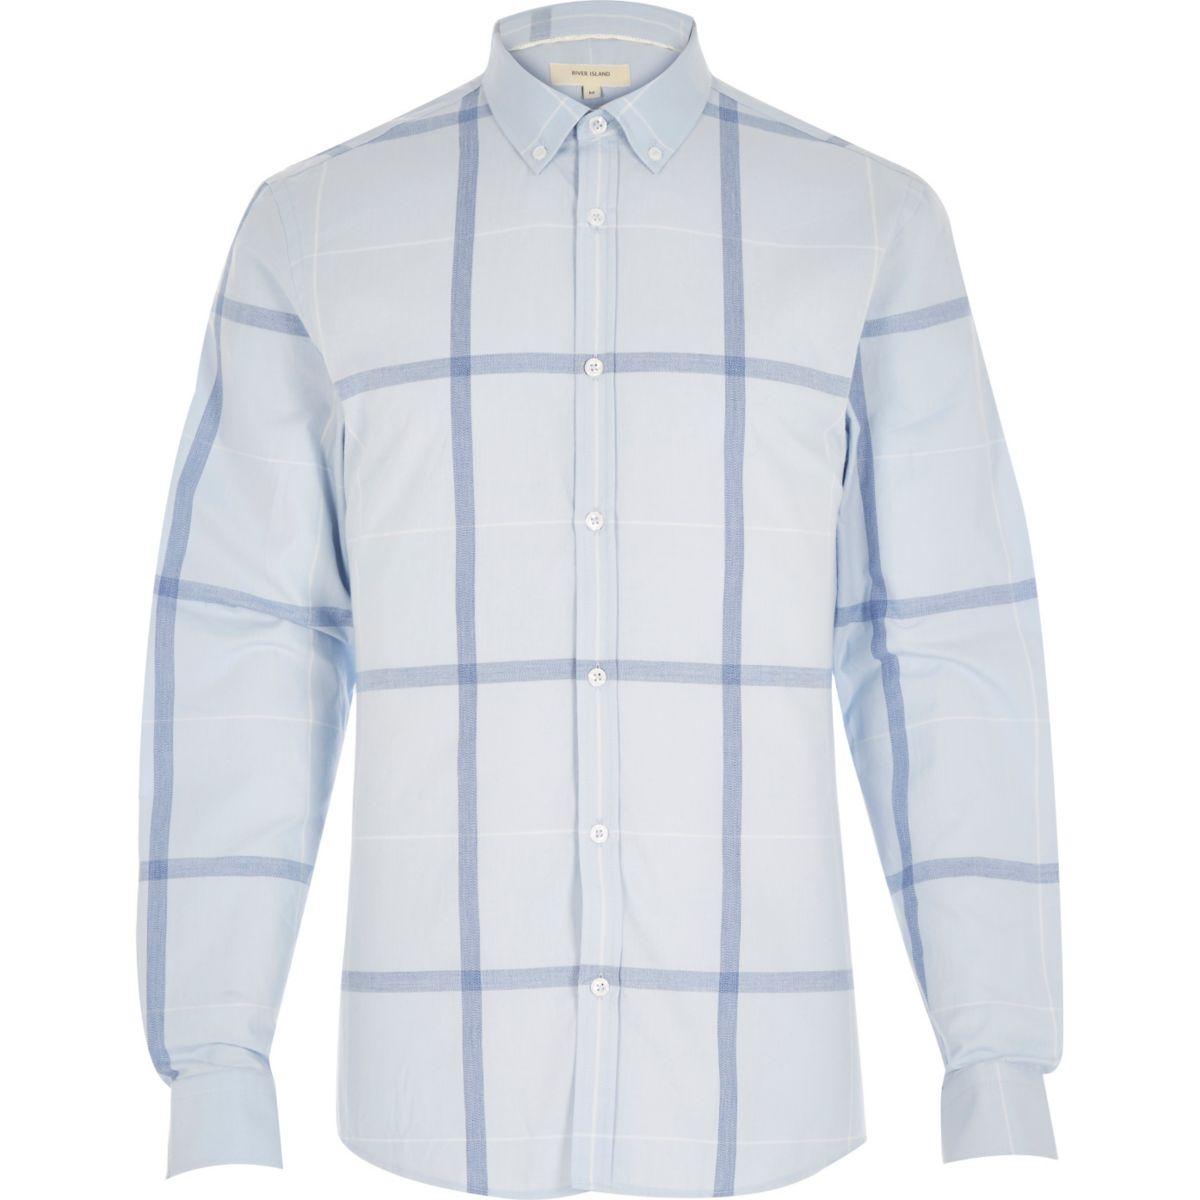 Blue oversized grid check shirt